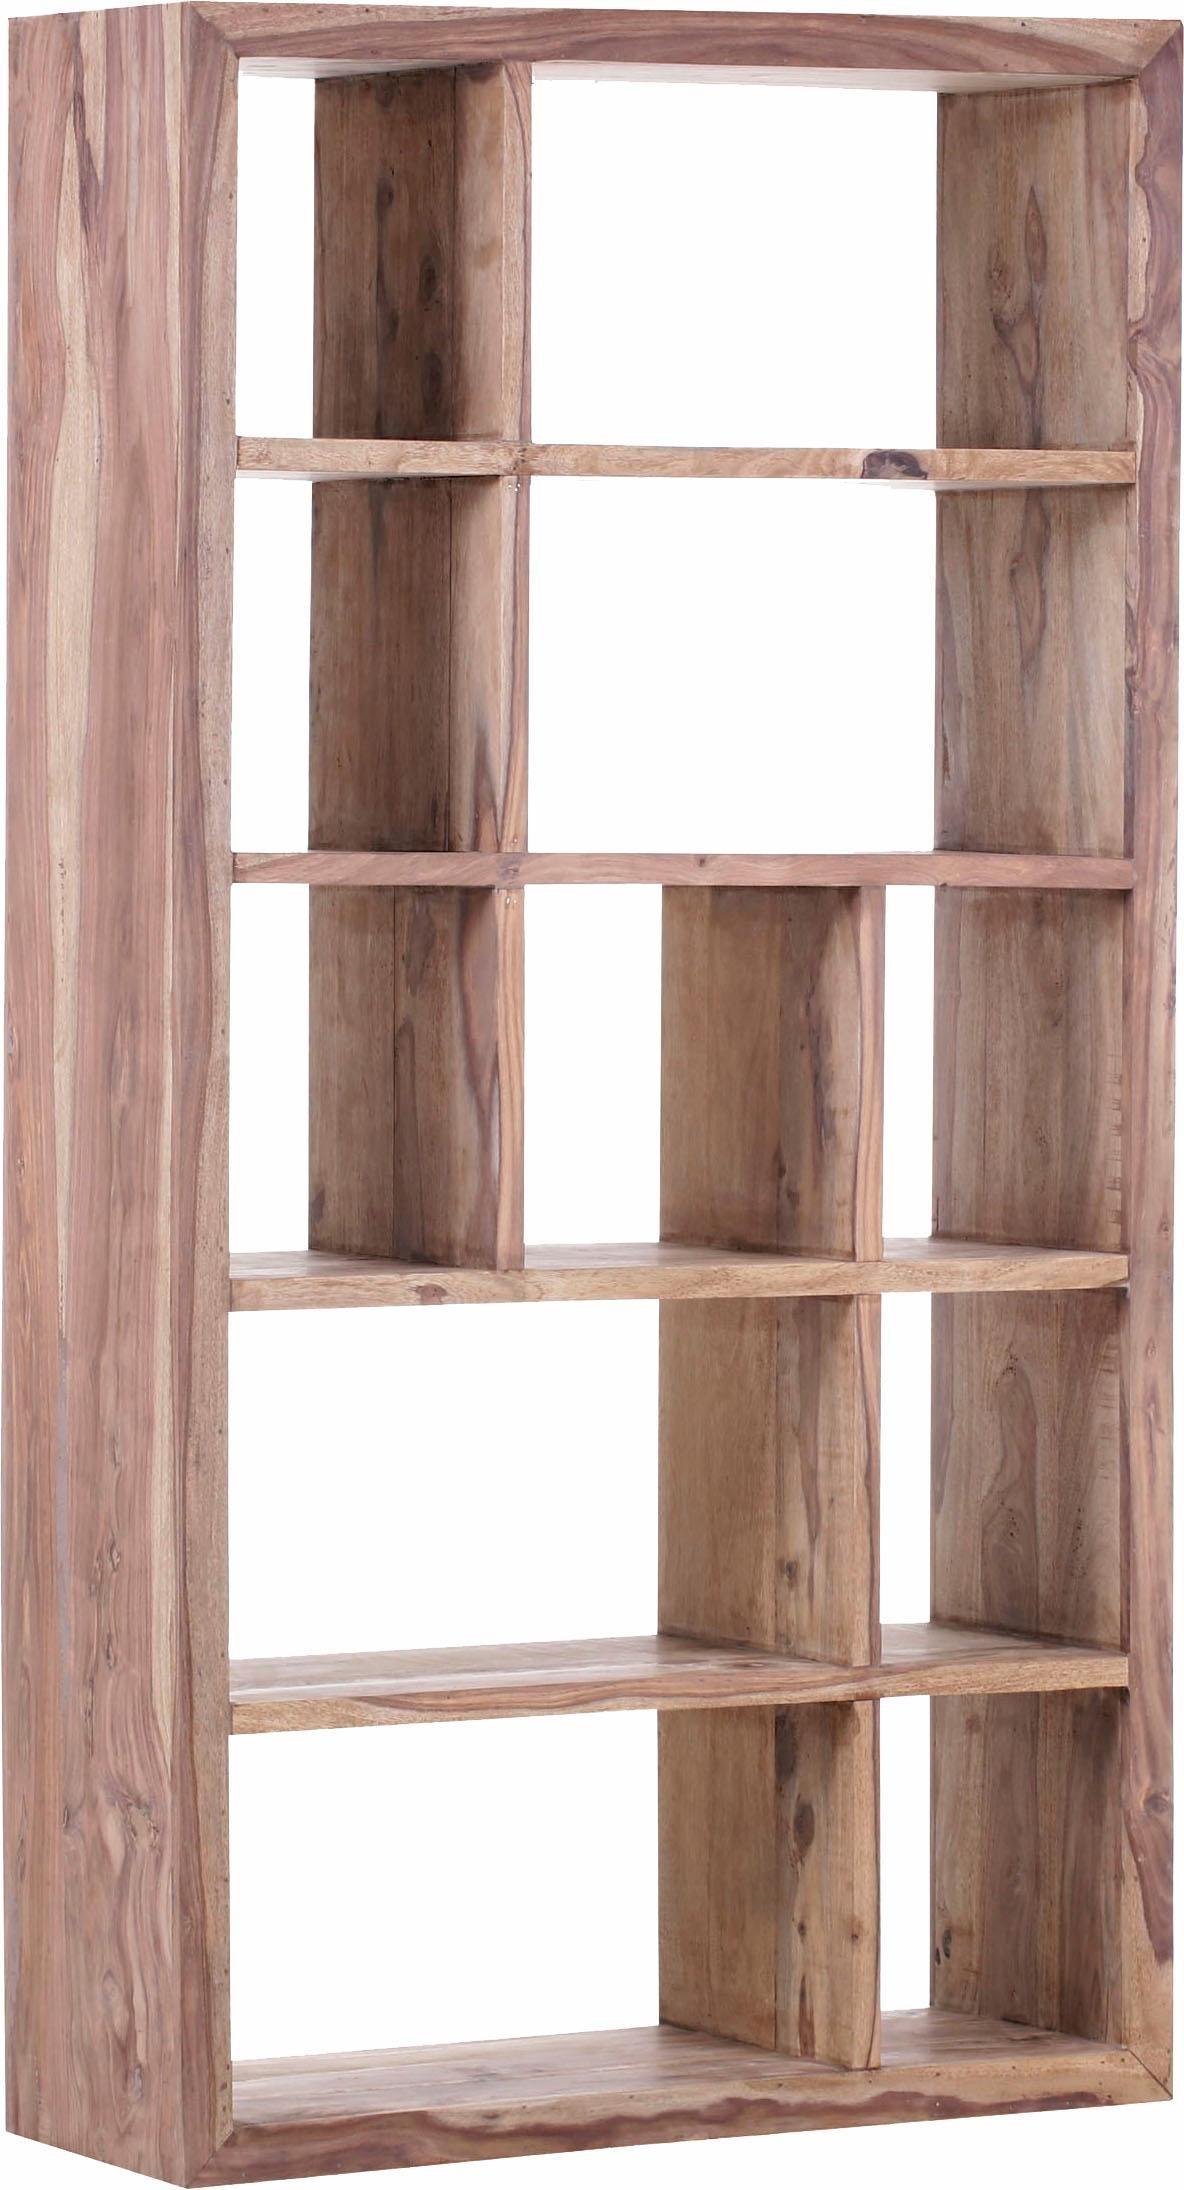 Gutmann Factory Raumteiler »Inka« aus massivem Sheesham Holz, Höhe 180 cm | Wohnzimmer > Regale > Raumteiler | Gutmann Factory